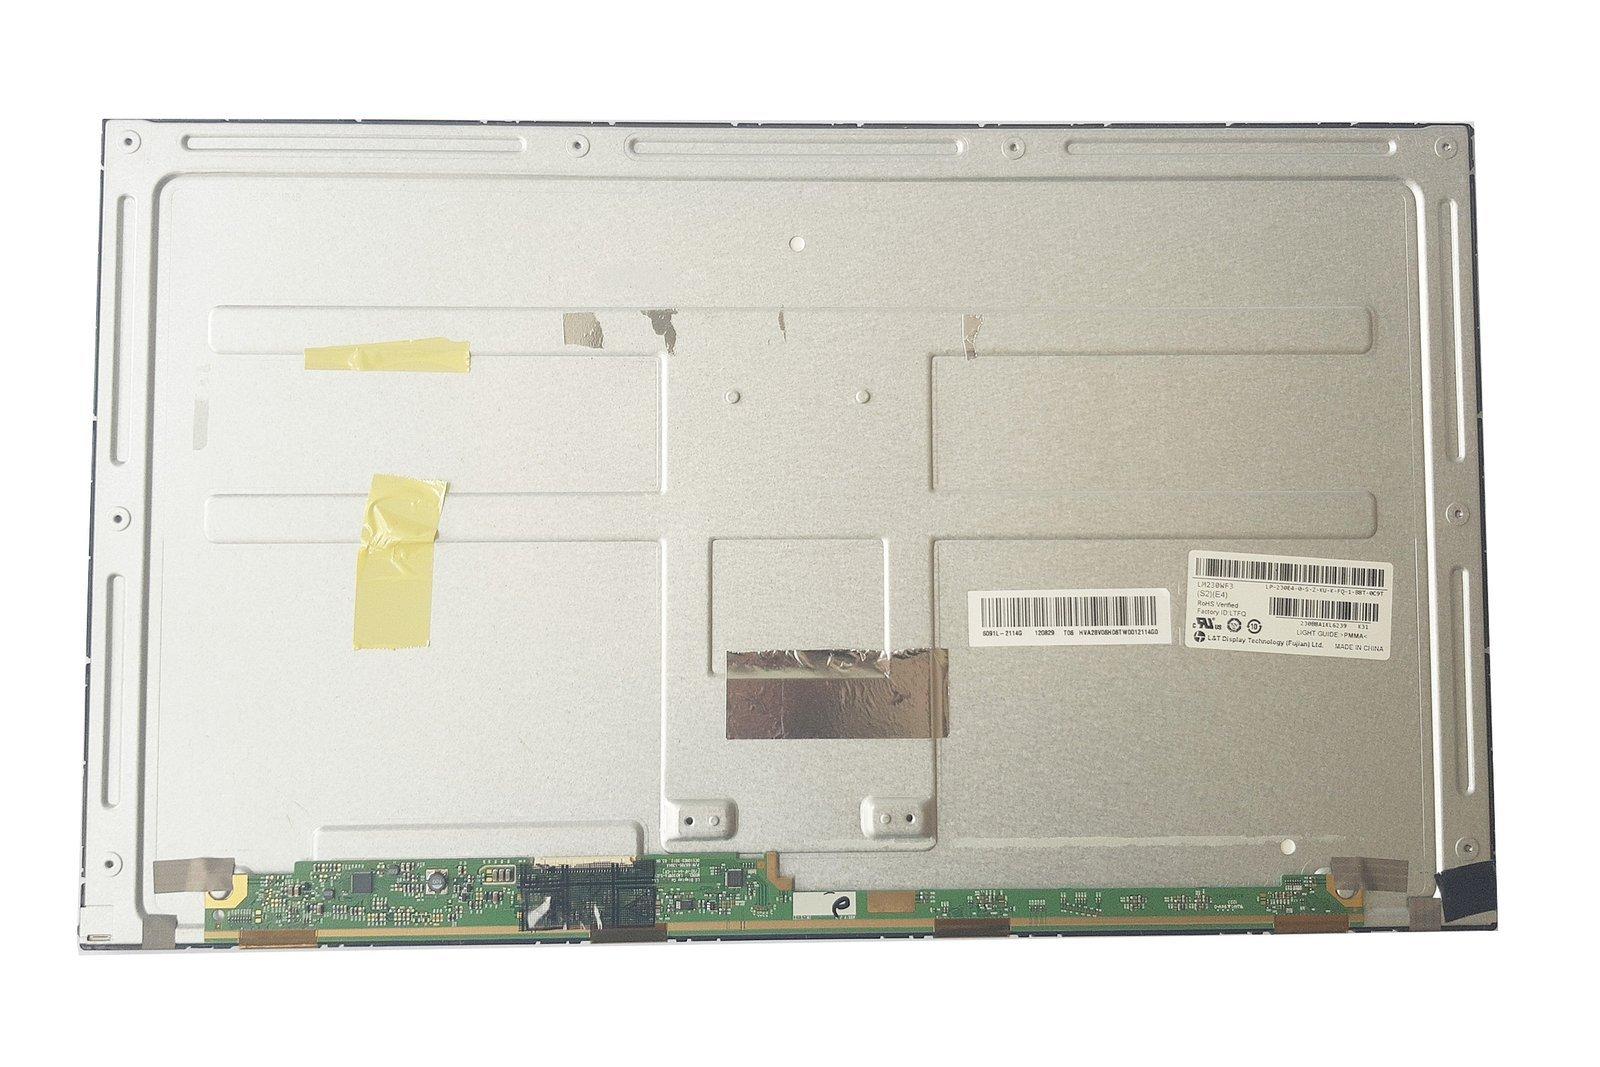 Bildschirm Display LG Display 23' LM230WF3-S2E4 1920x1080